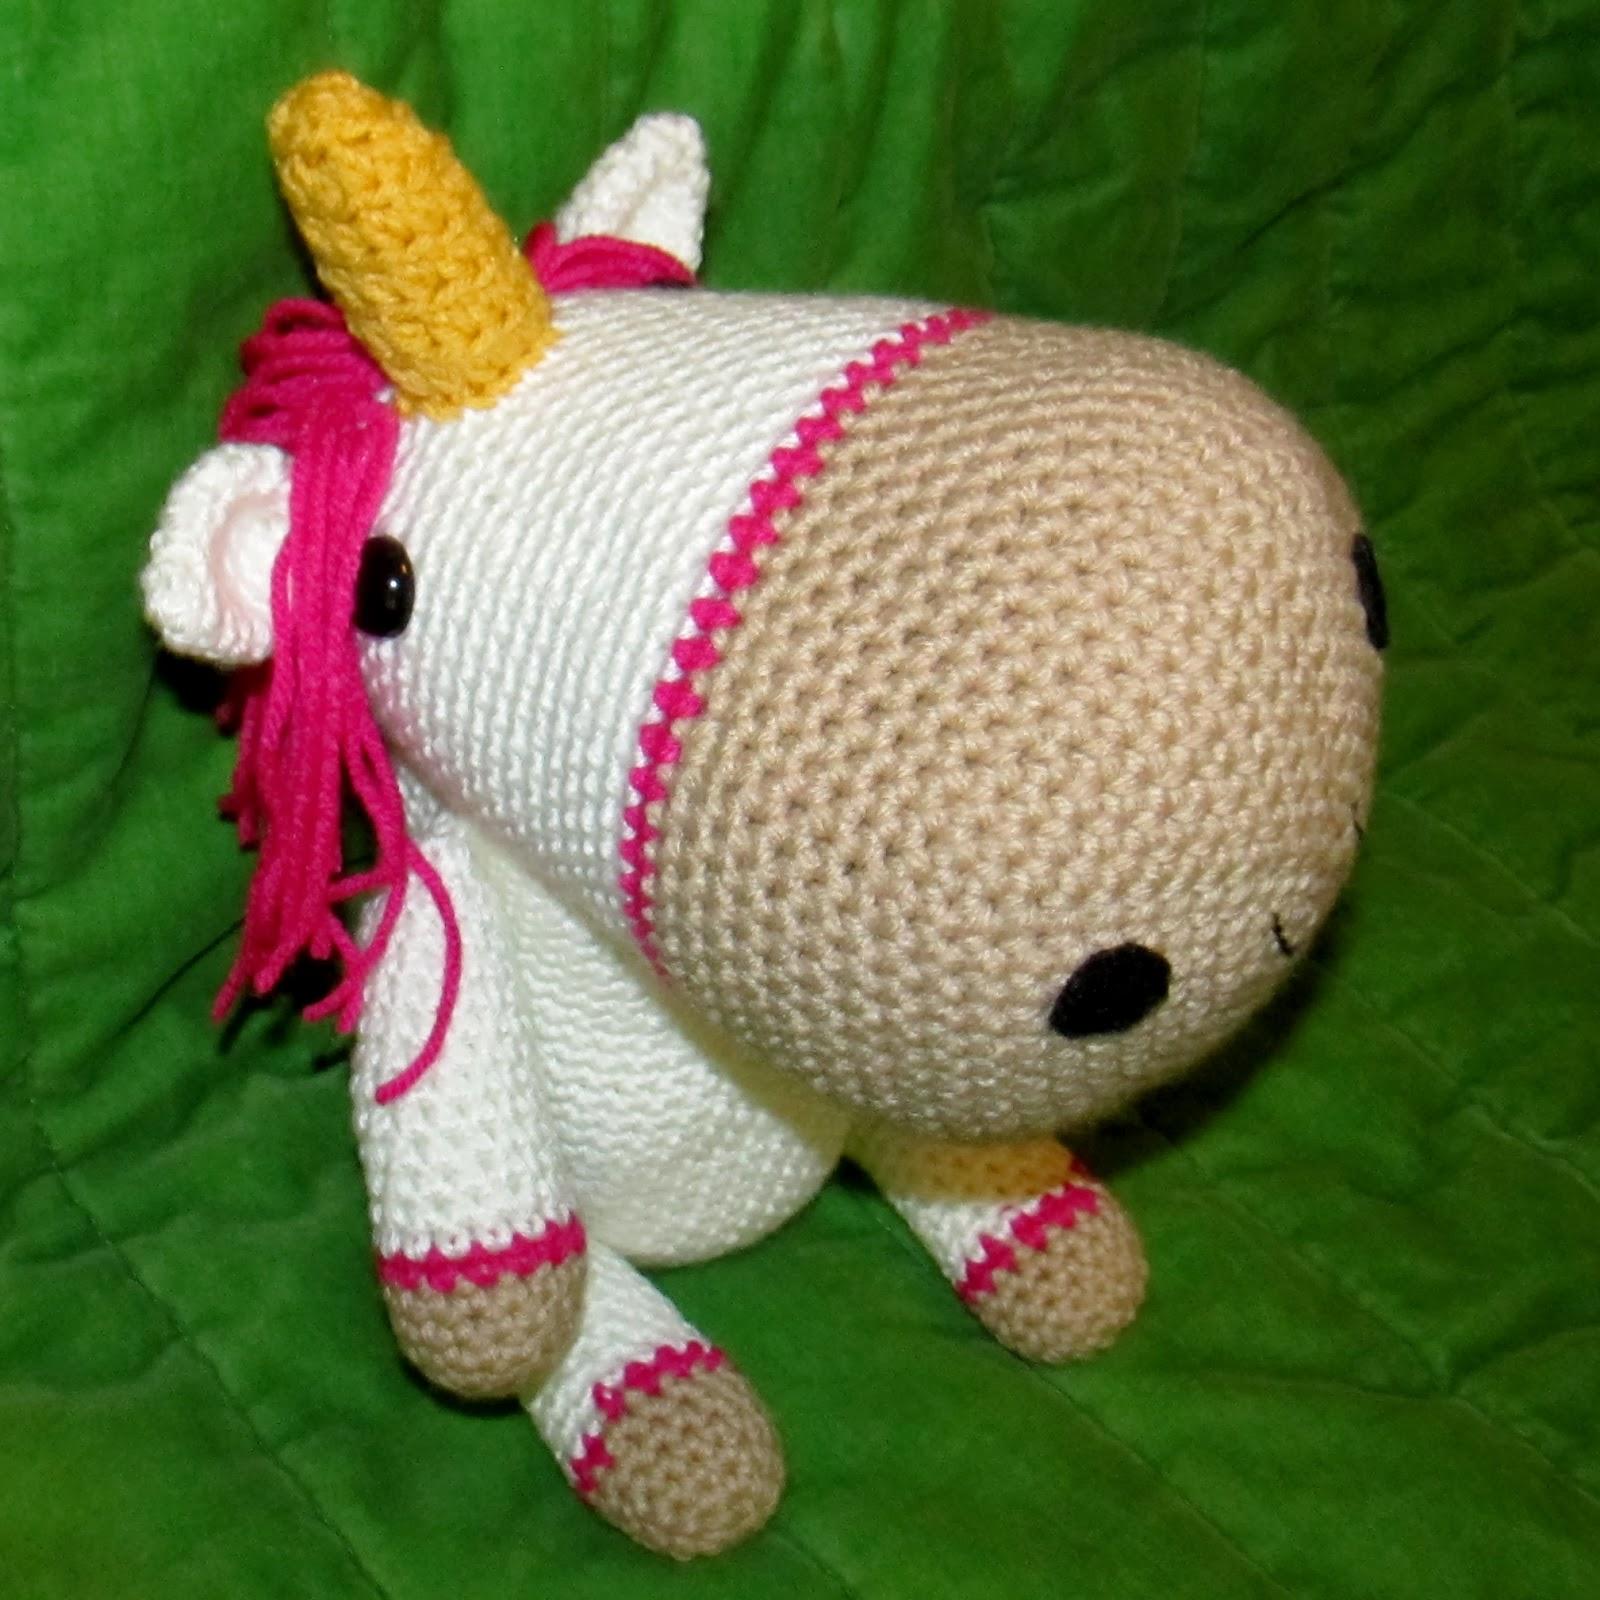 Crochet Unicorn Pattern : ... Paulas Amigurumi Patterns & Random Cuteness: Unicorn Crochet Along